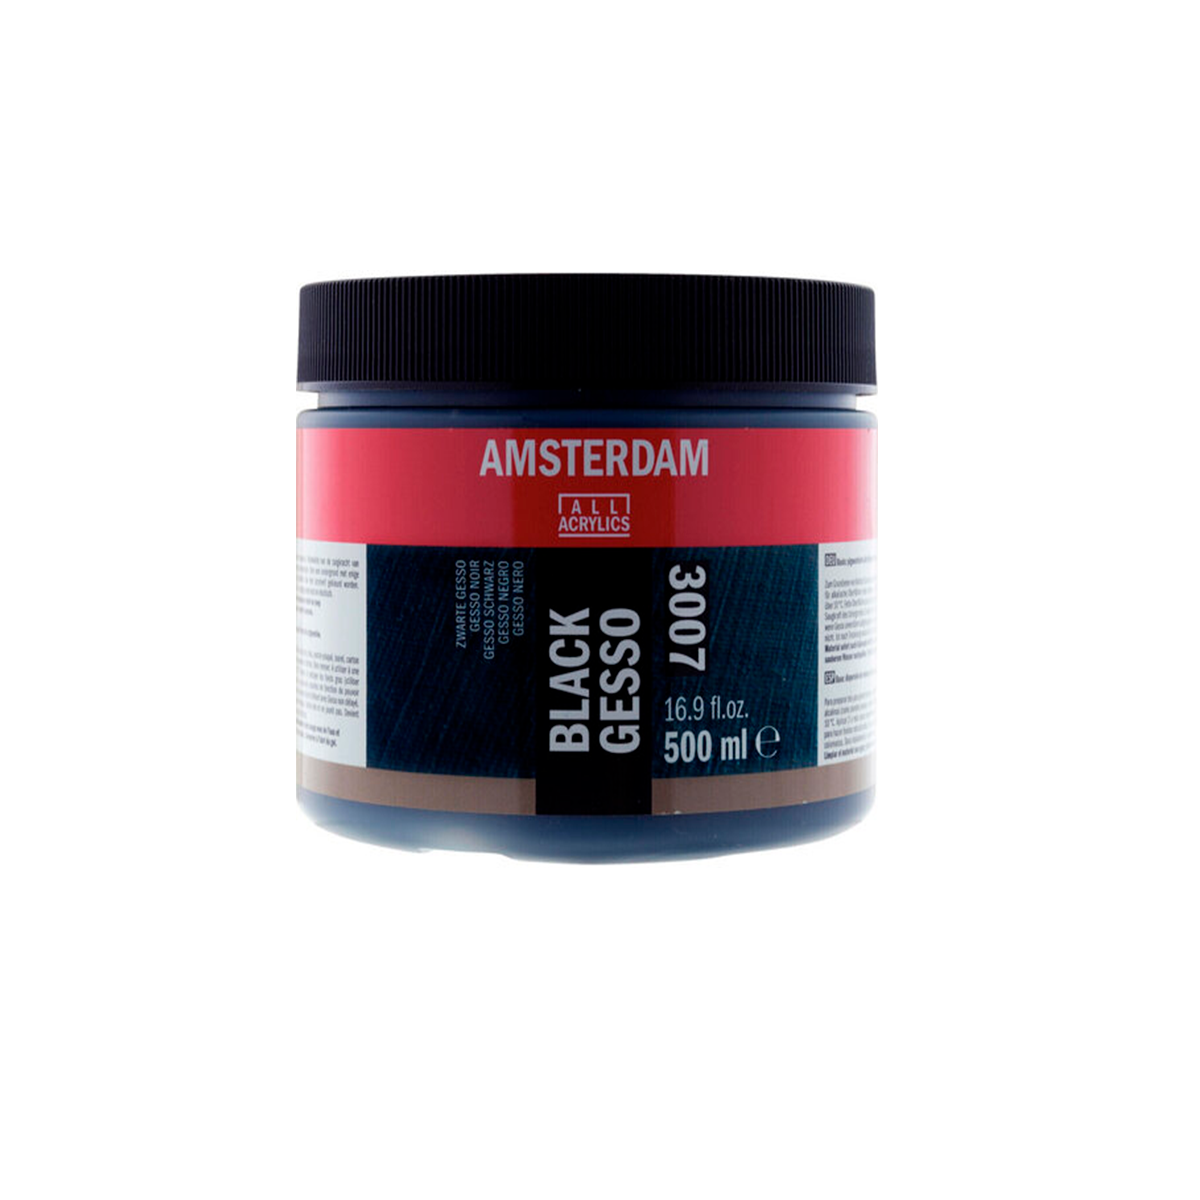 AMSTERDAMGesso500ml-04